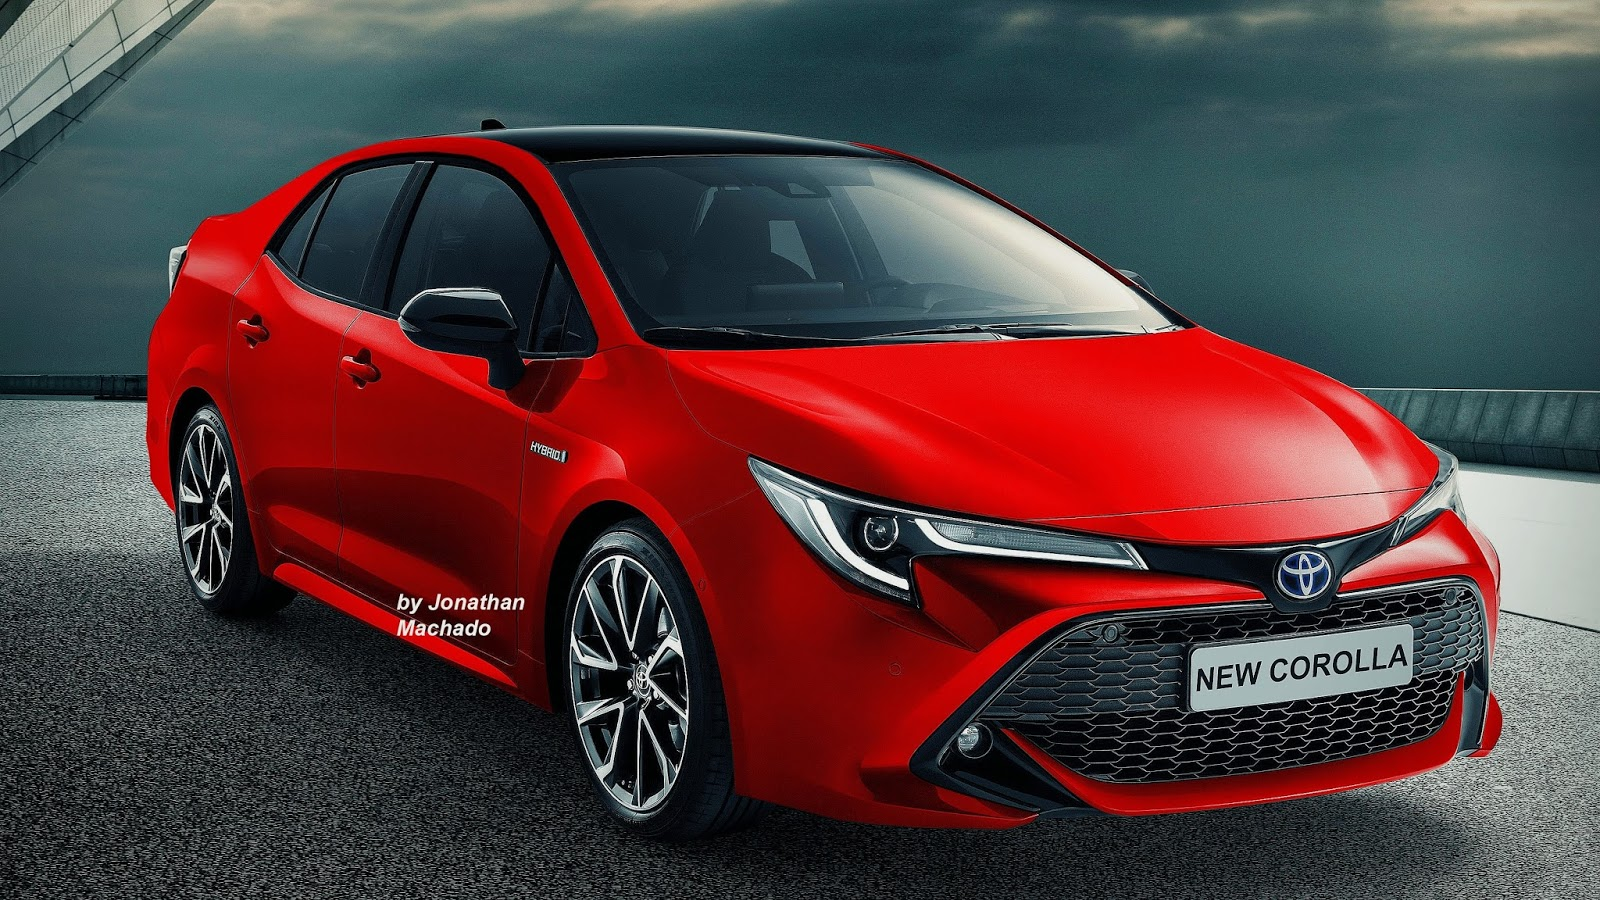 Next Gen 2019 Toyota Corolla Altis 2019 Toyota Corolla Sedan Imagined